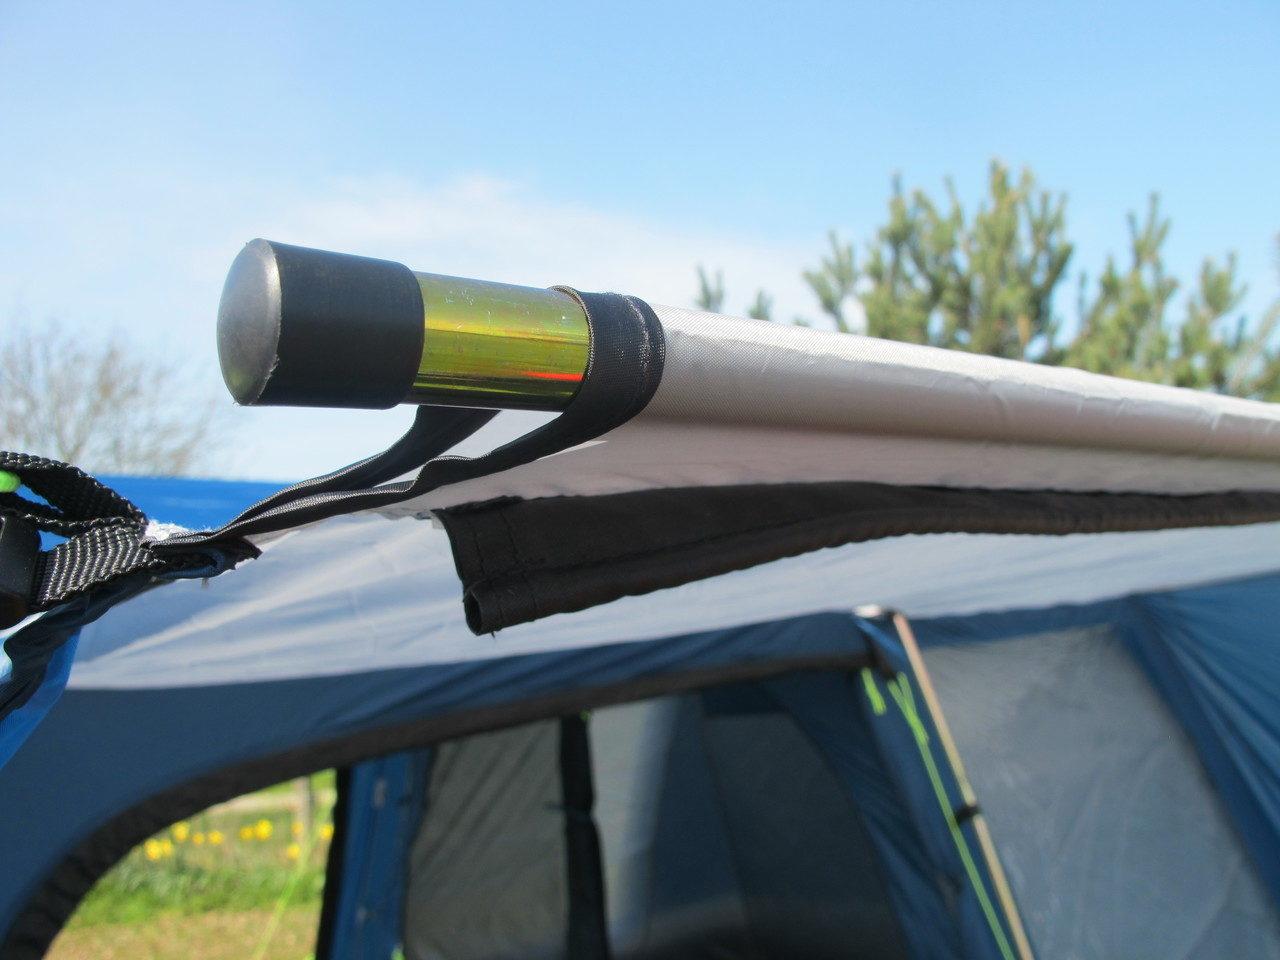 Kampa CE749011 Pole & Clamp Set